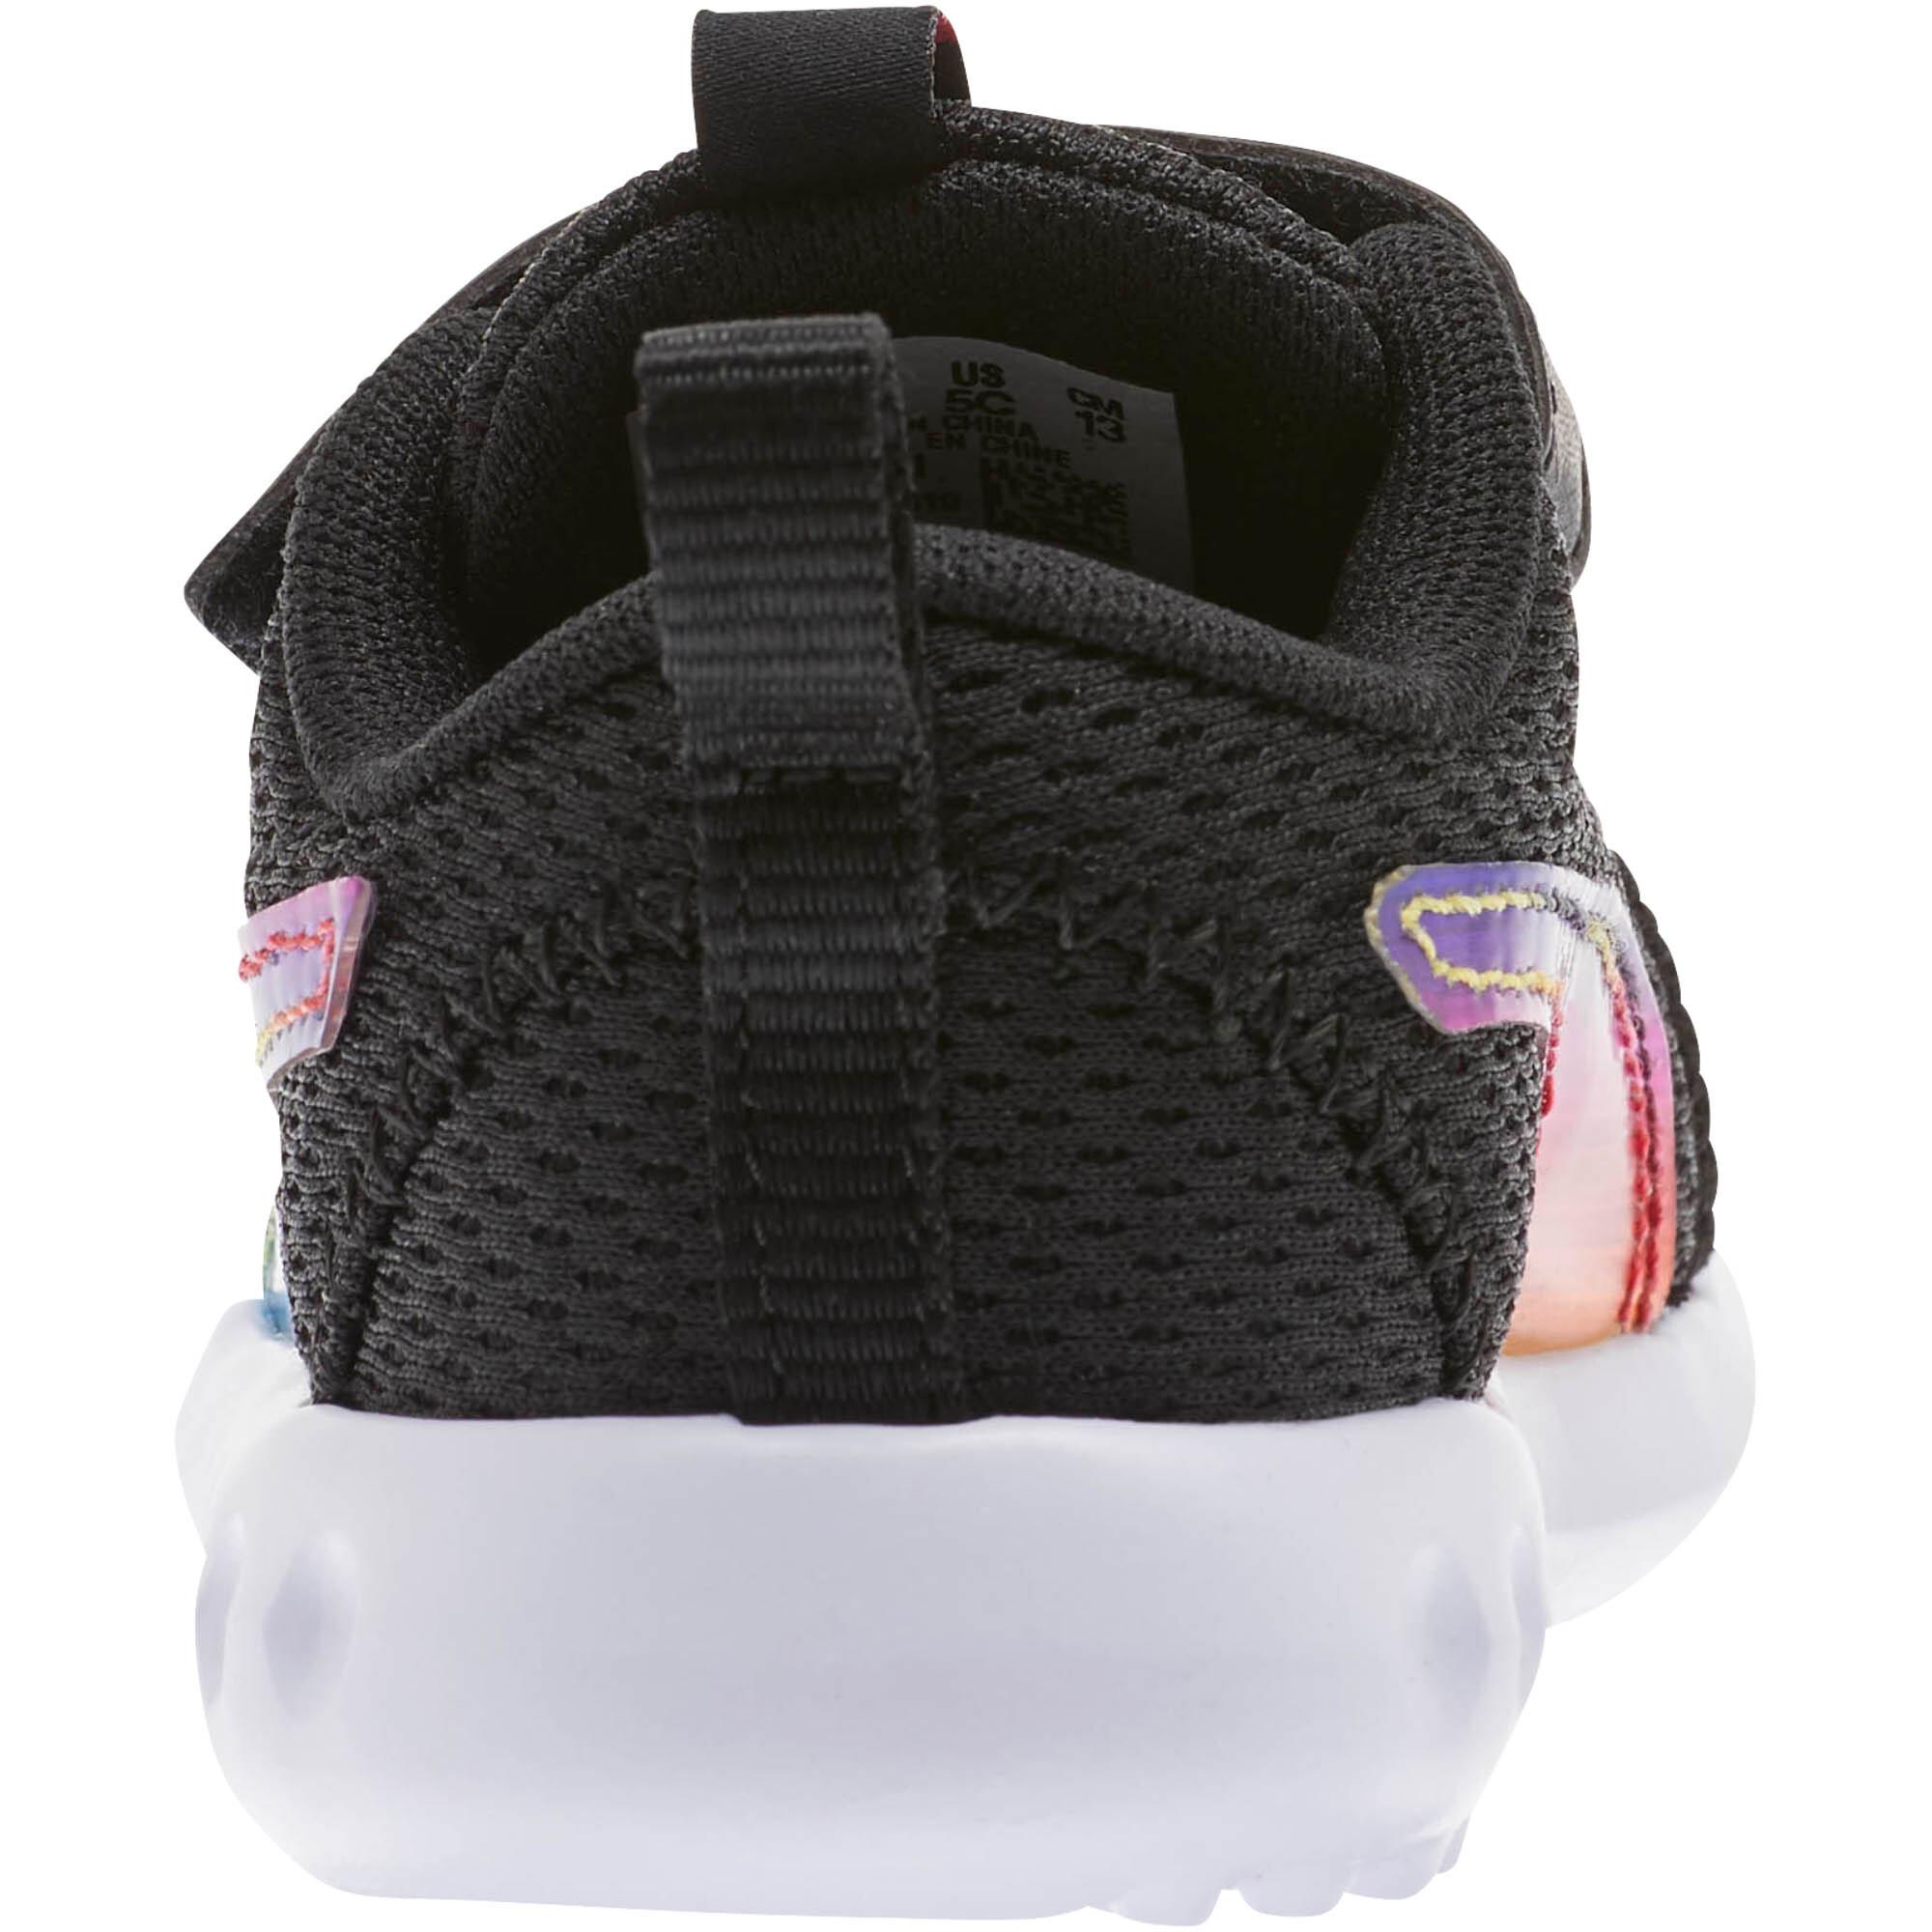 PUMA-Carson-2-Iridescent-Toddler-Shoes-Girls-Shoe-Kids thumbnail 3